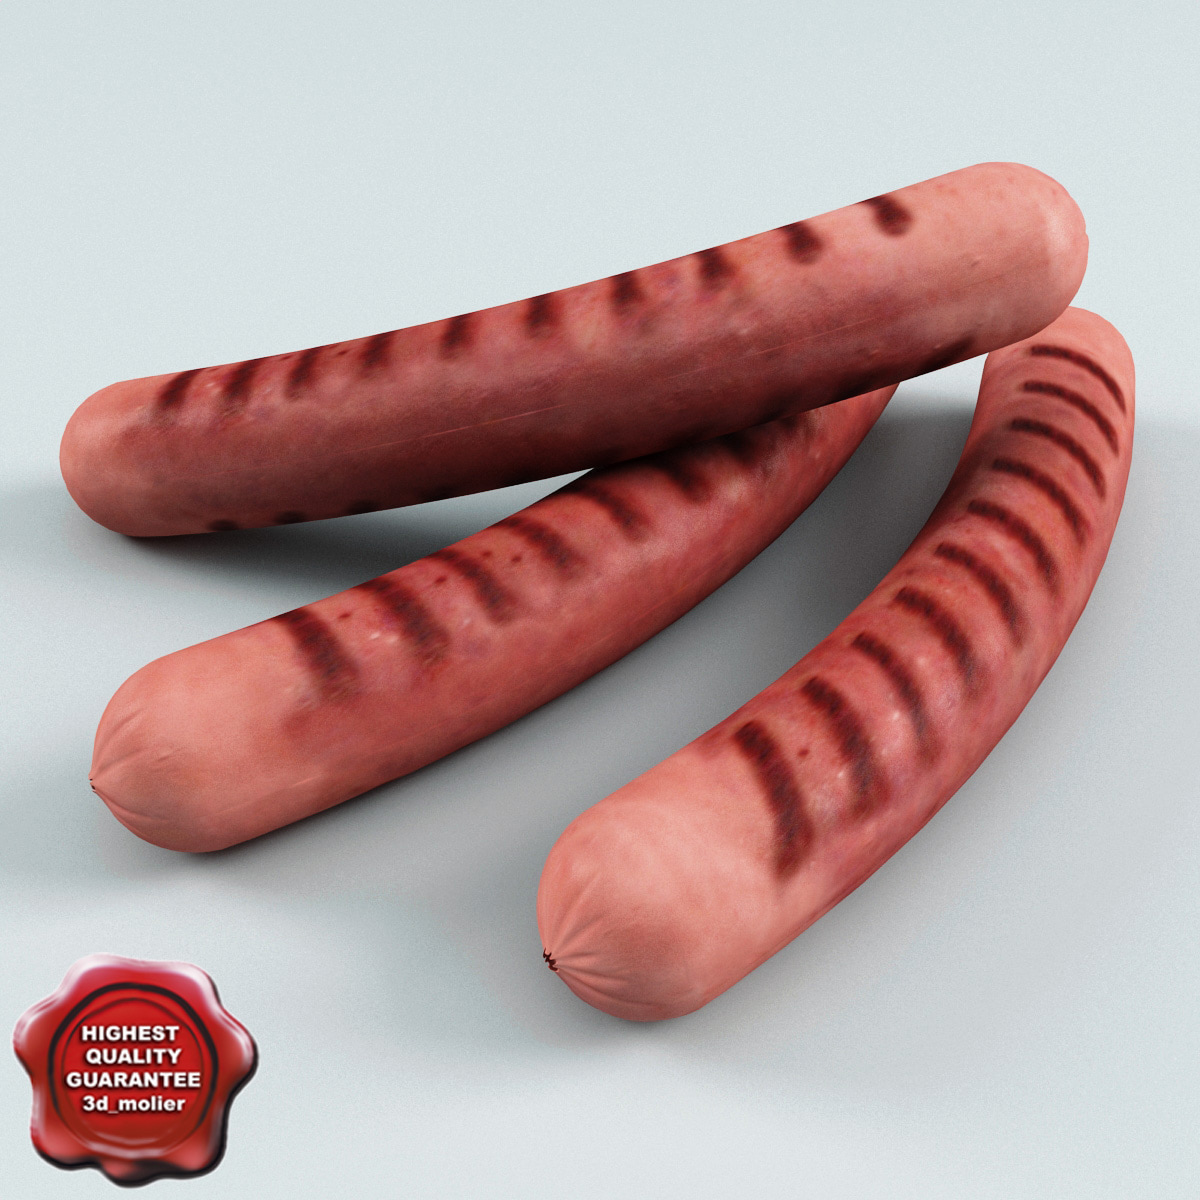 Grilling_Sausages_0.jpg